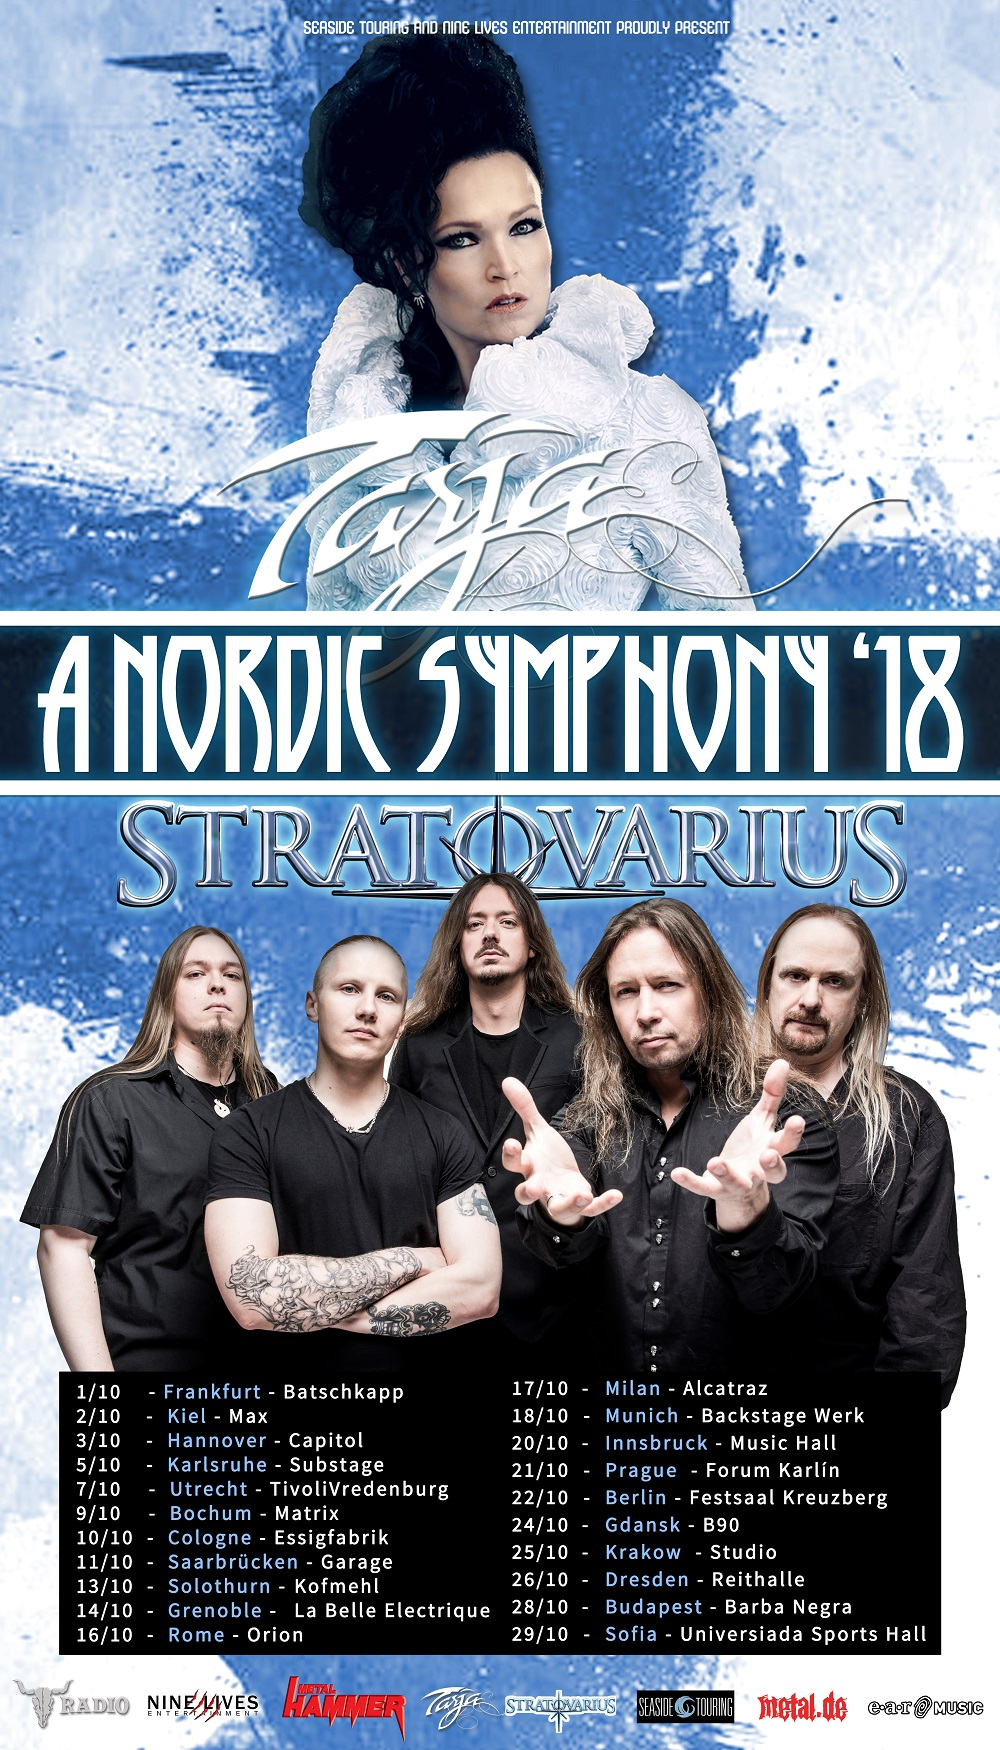 Bild Tarja & Startovarius - A Nordic Symphony Tour 2018 Poster